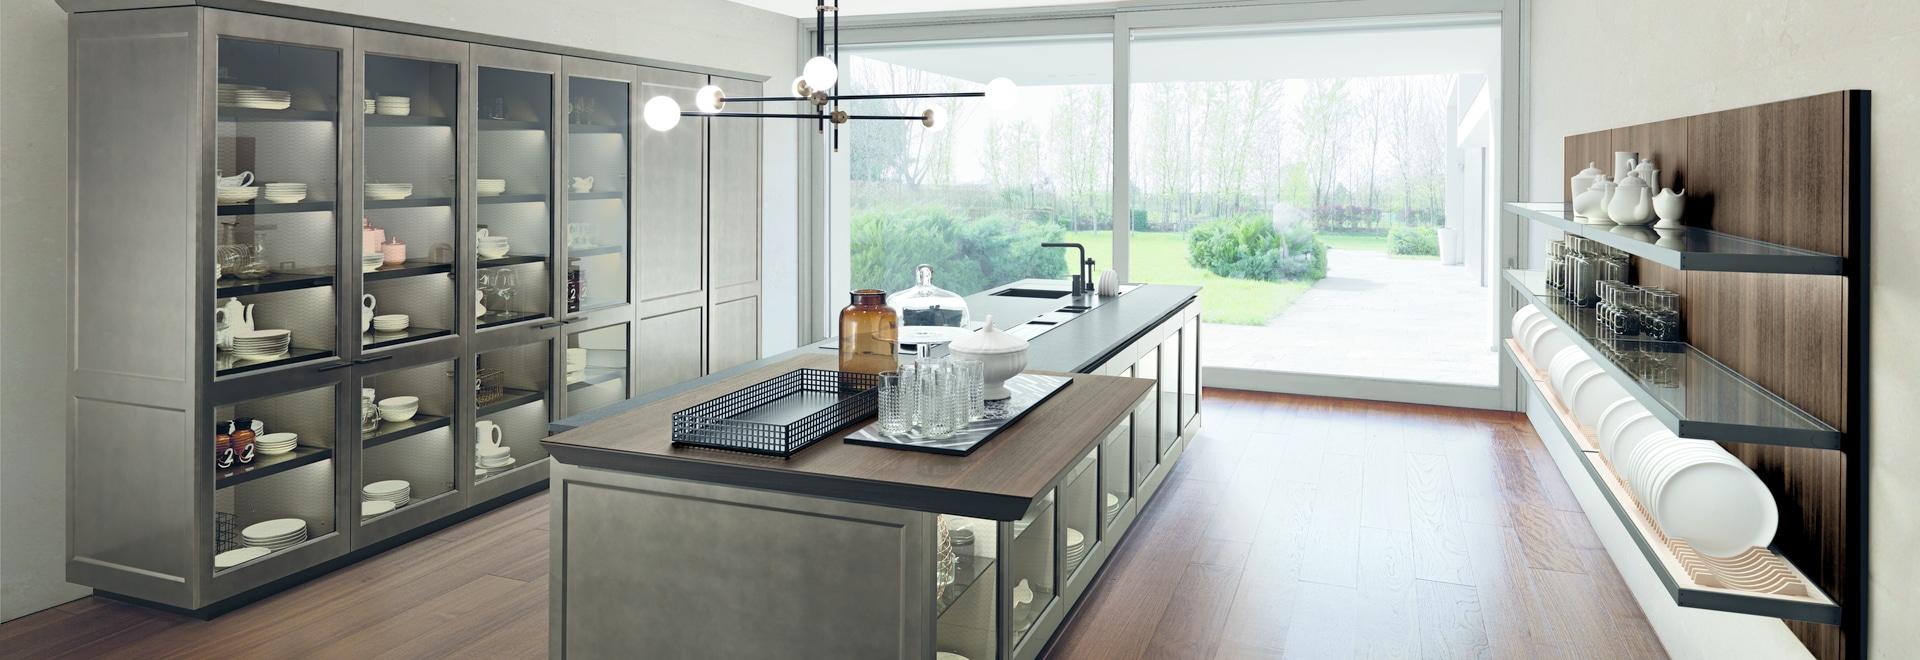 Prezzi Cucine Euromobil. Free Fresco Ar Tre Cucine Cucine With ...